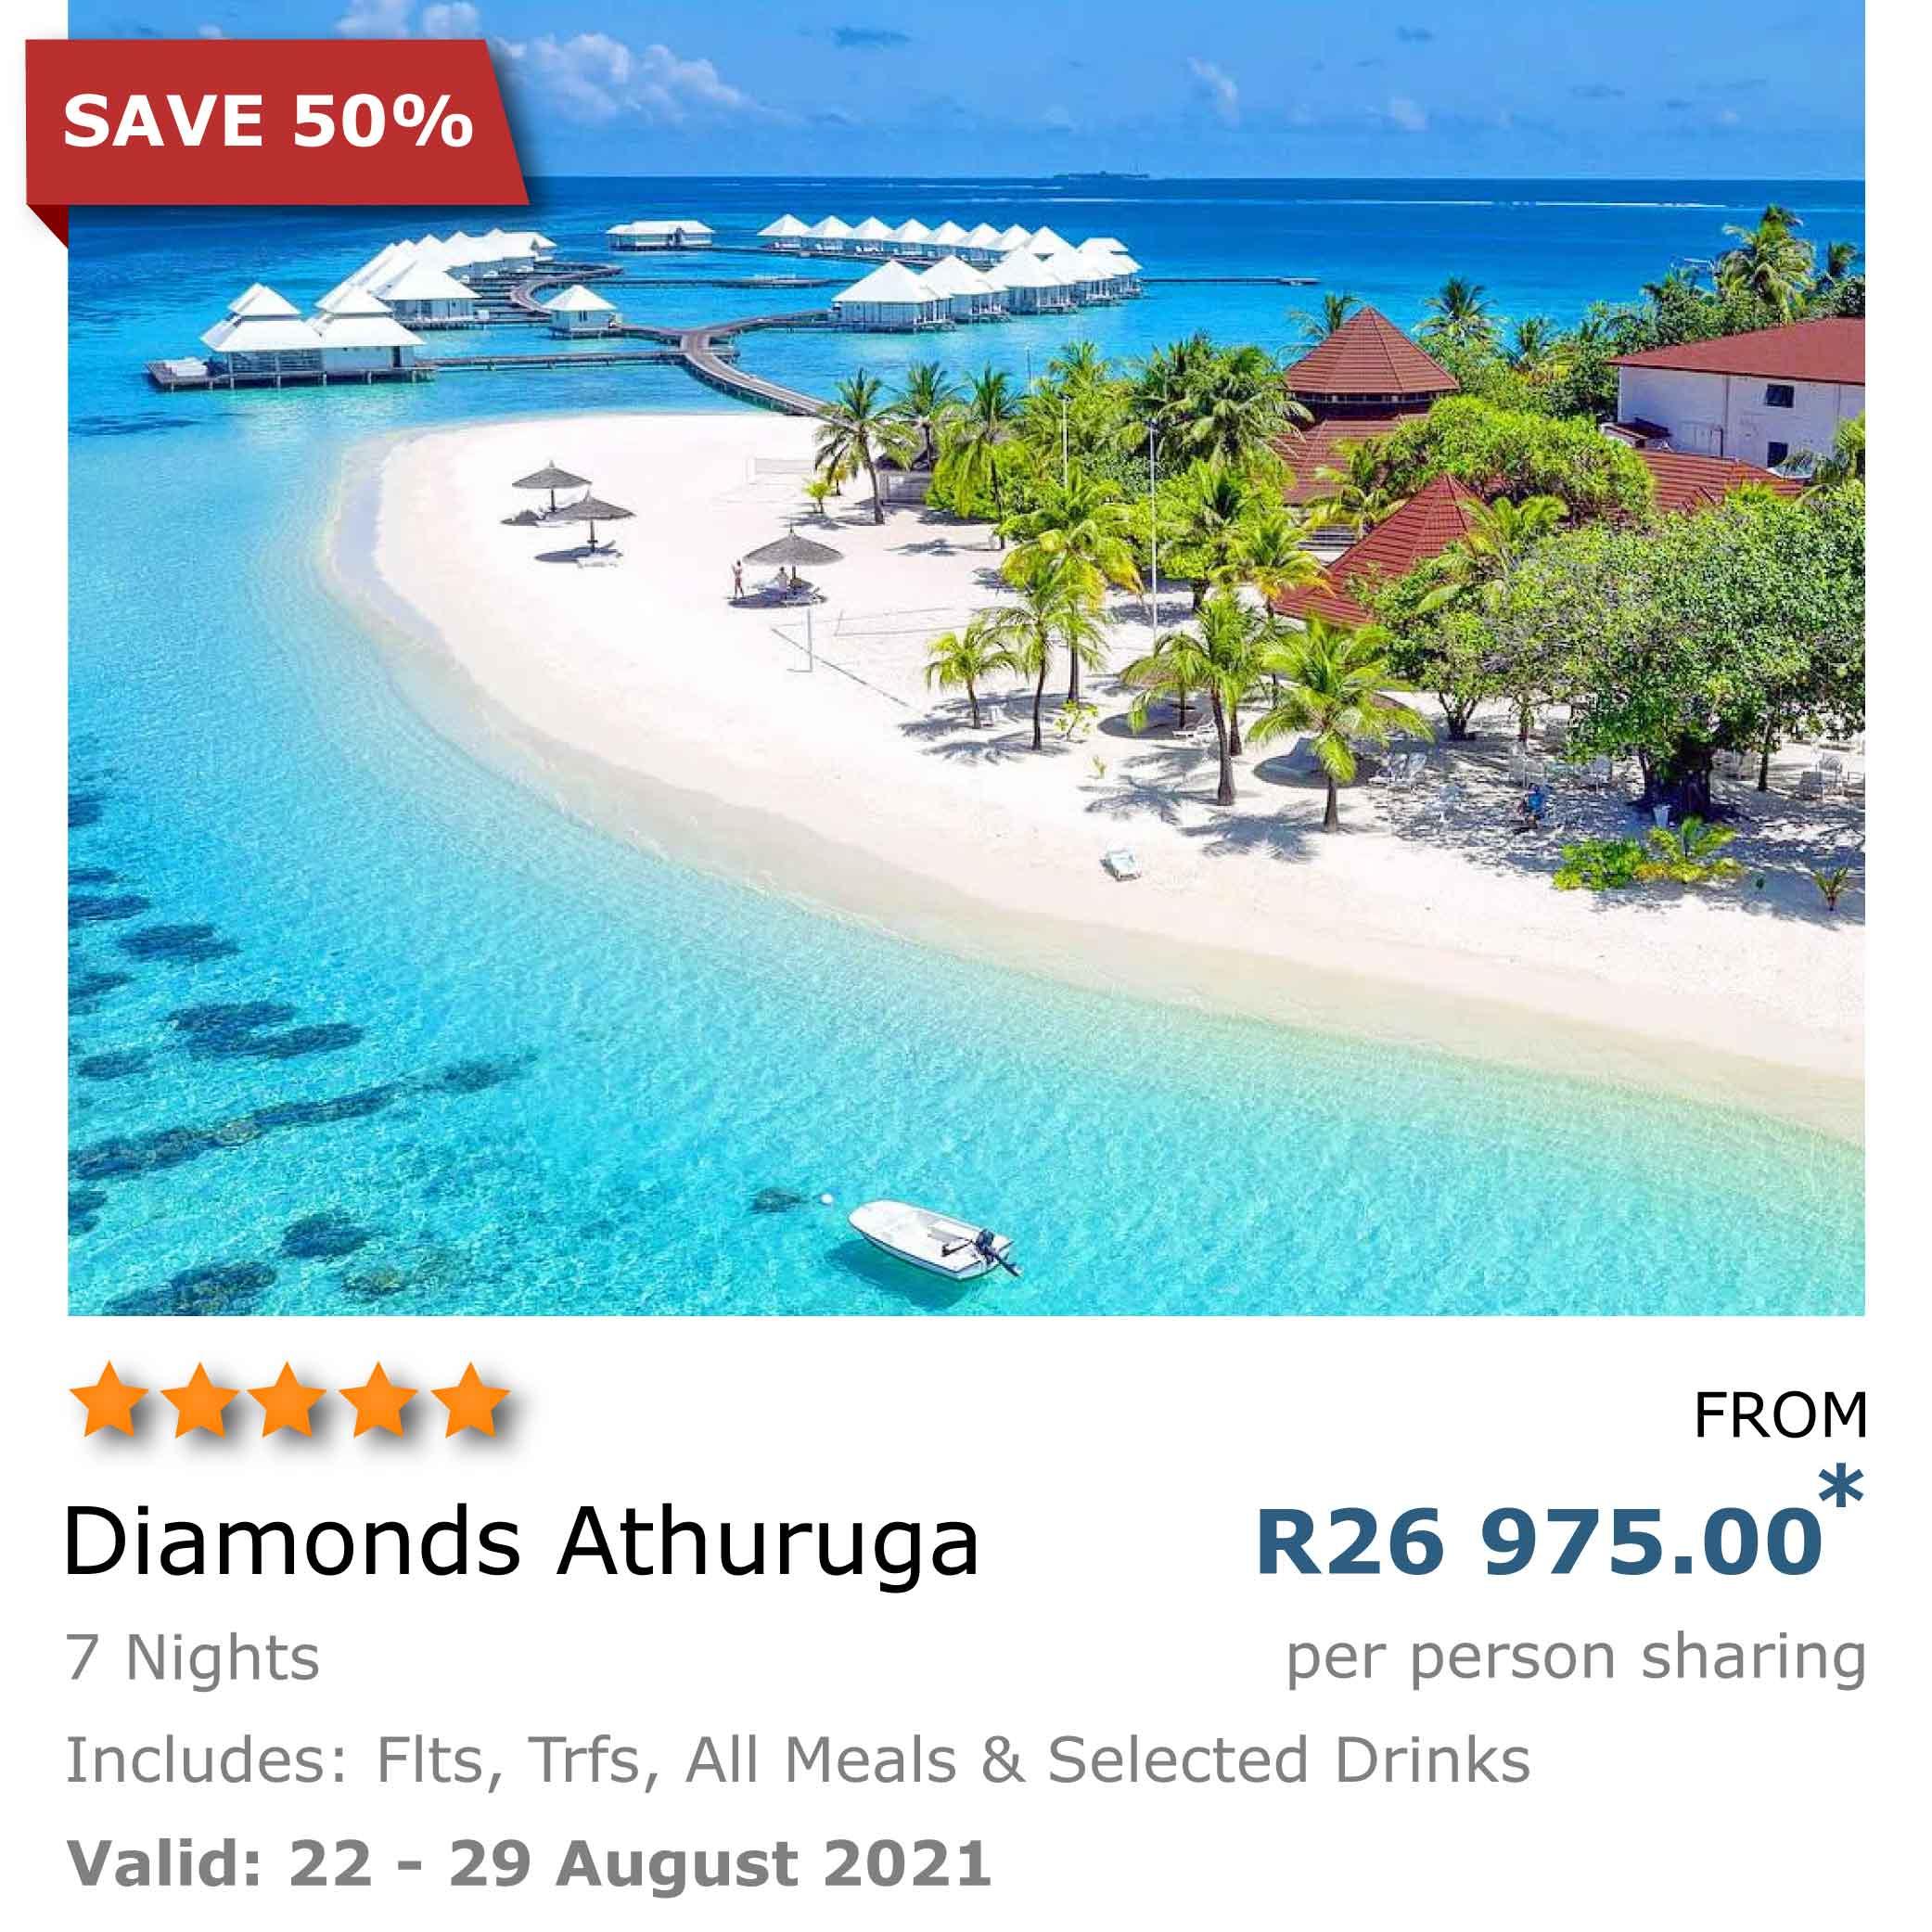 Diamonds Athuruga